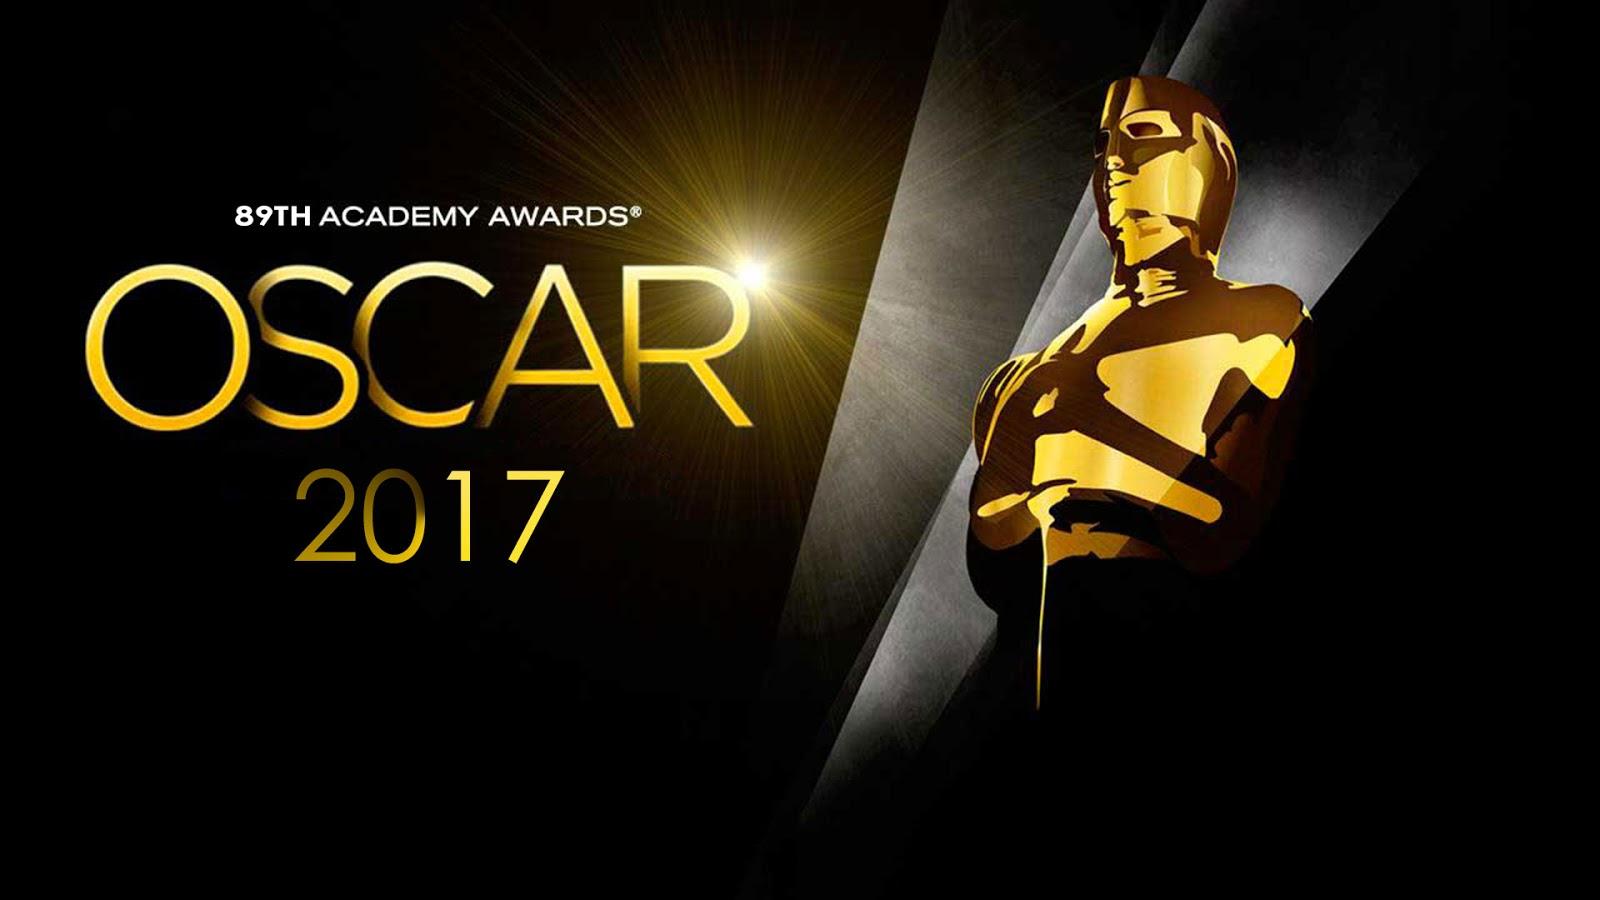 Tutti gli Oscar 2017 minuto per minuto